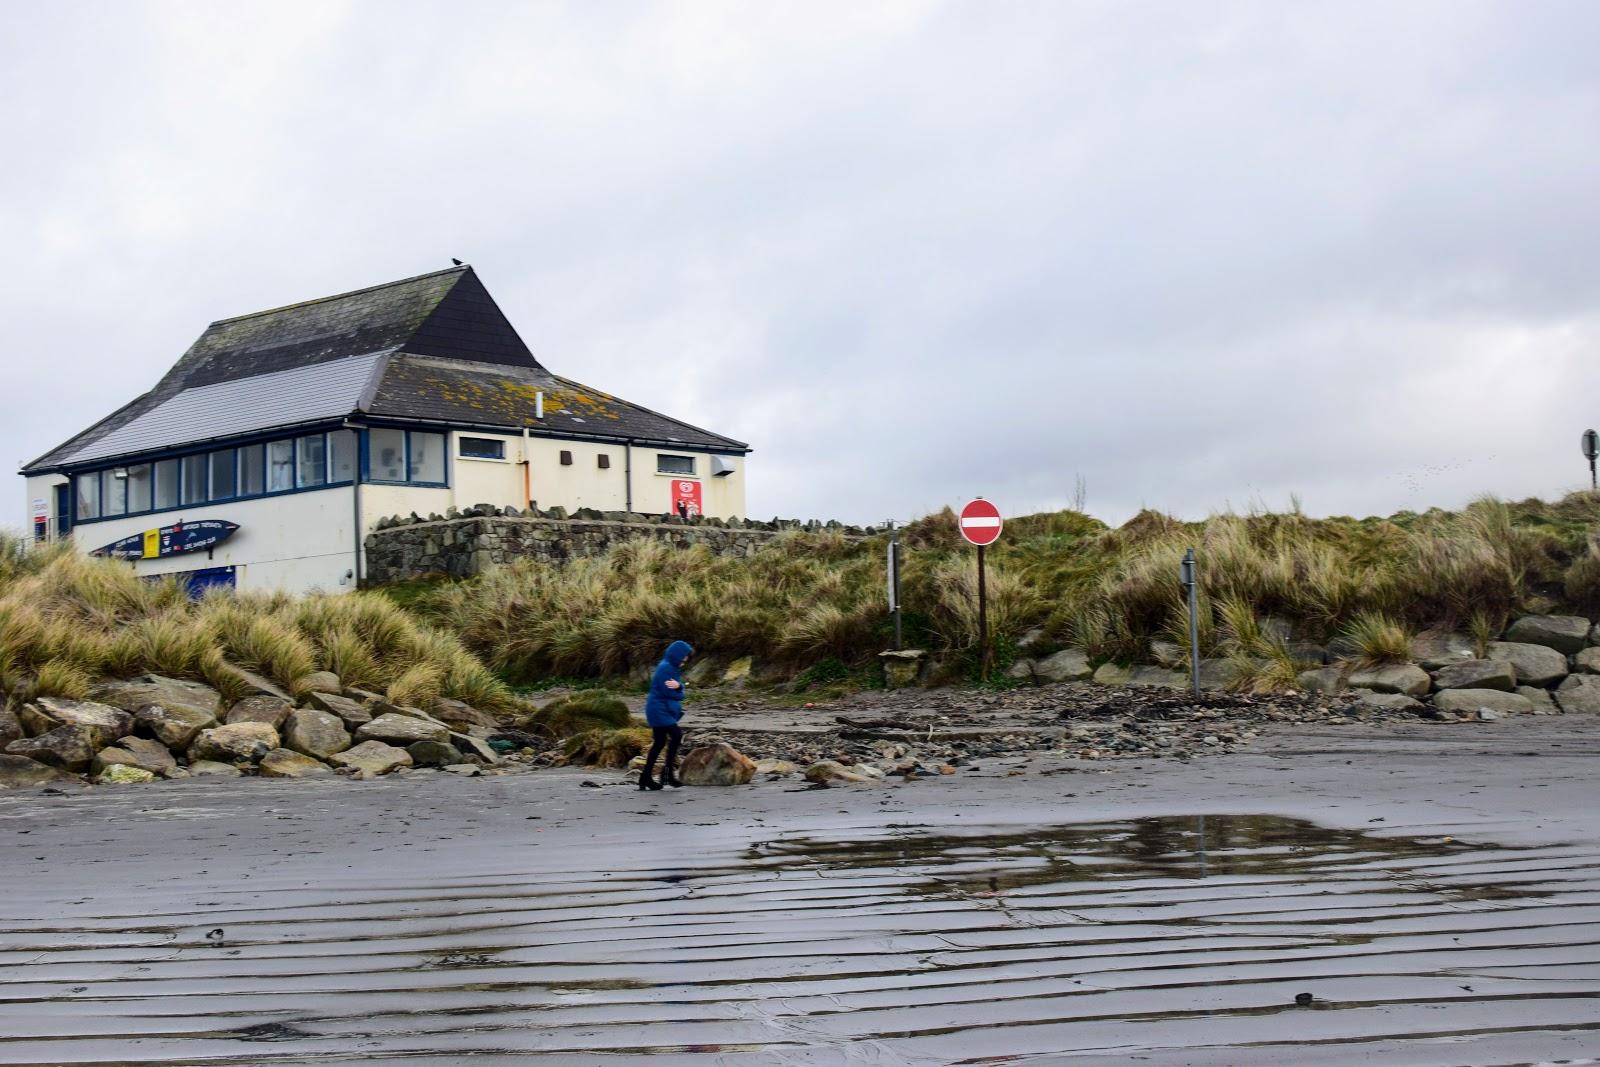 Newport Sands, Beach, Bay, Coast, Pembrokeshire, Pembrokeshire Coast, days out, free days out, visit Pembrokeshire, travel, family adventure, family day out, adventure, outdoors, get outdoors, family travel